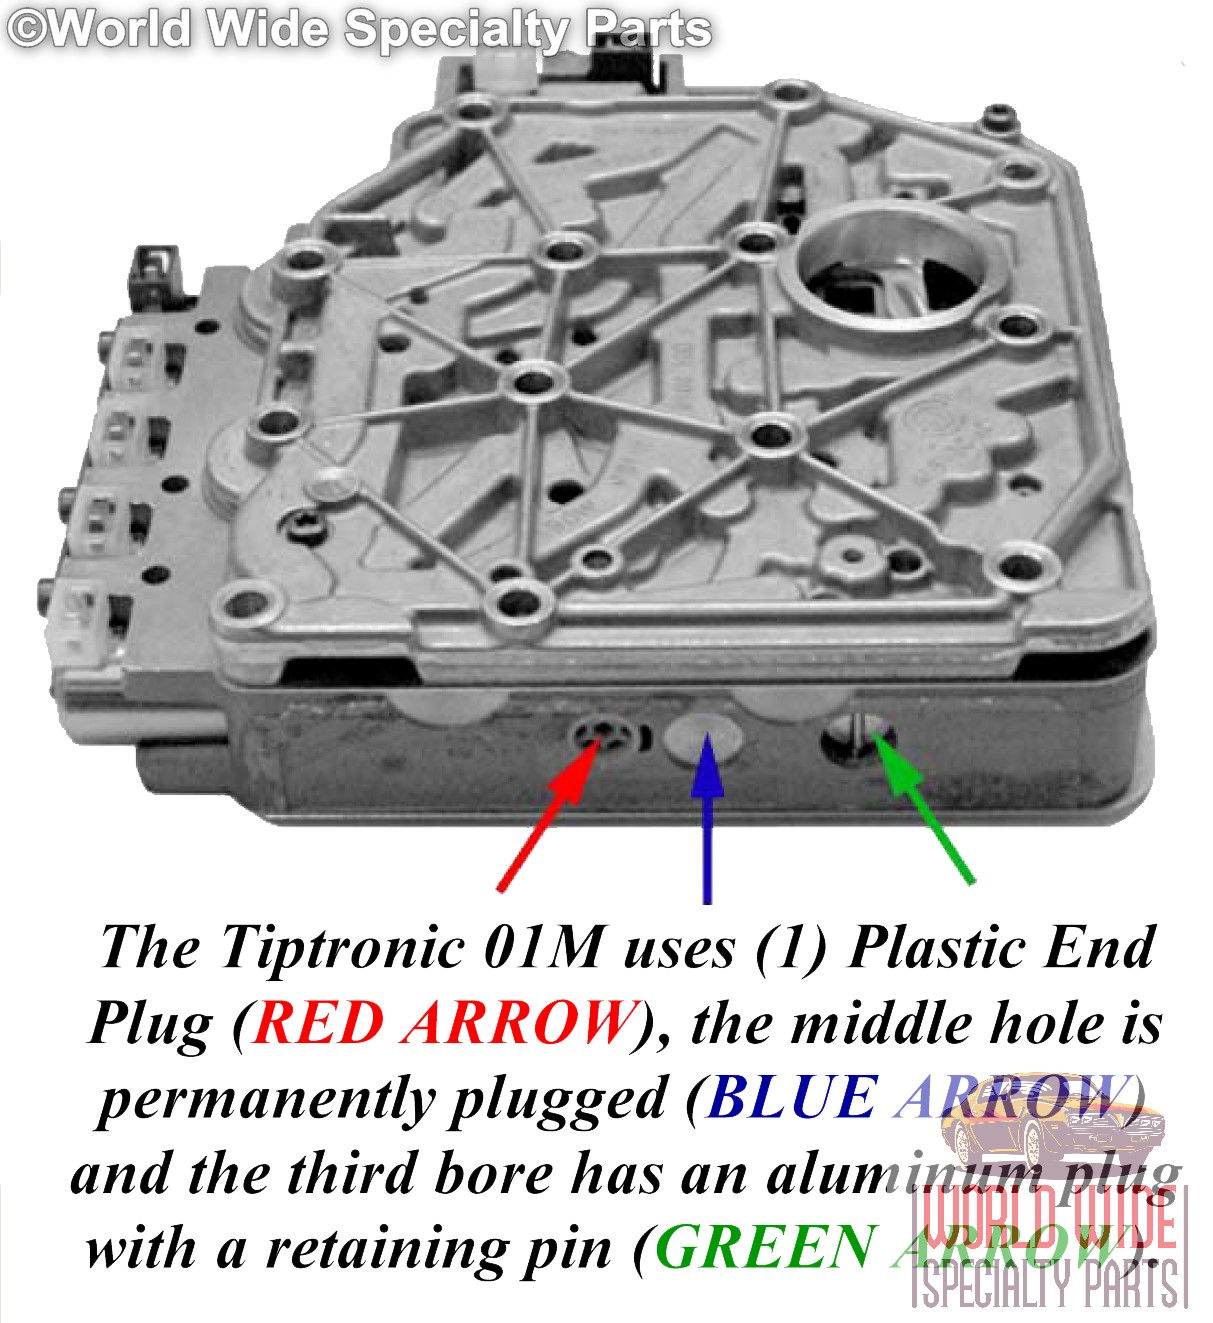 vw beetle transmission diagram msd ignition digital 6a anleitung wiring 2001 jetta honda s2000